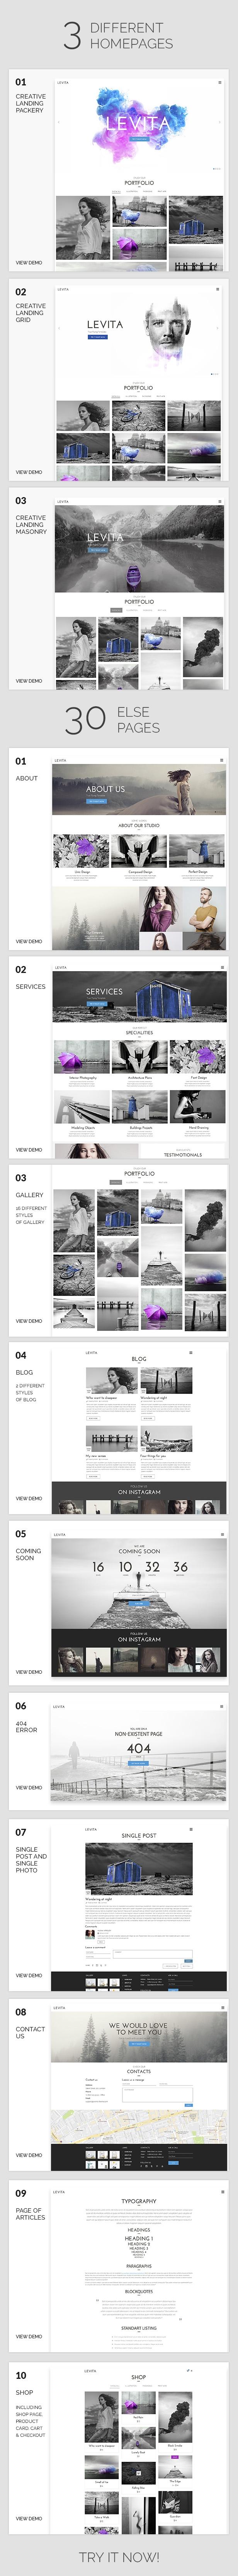 Fotografie    Levita Fotografie WordPress für Fotografie - 6